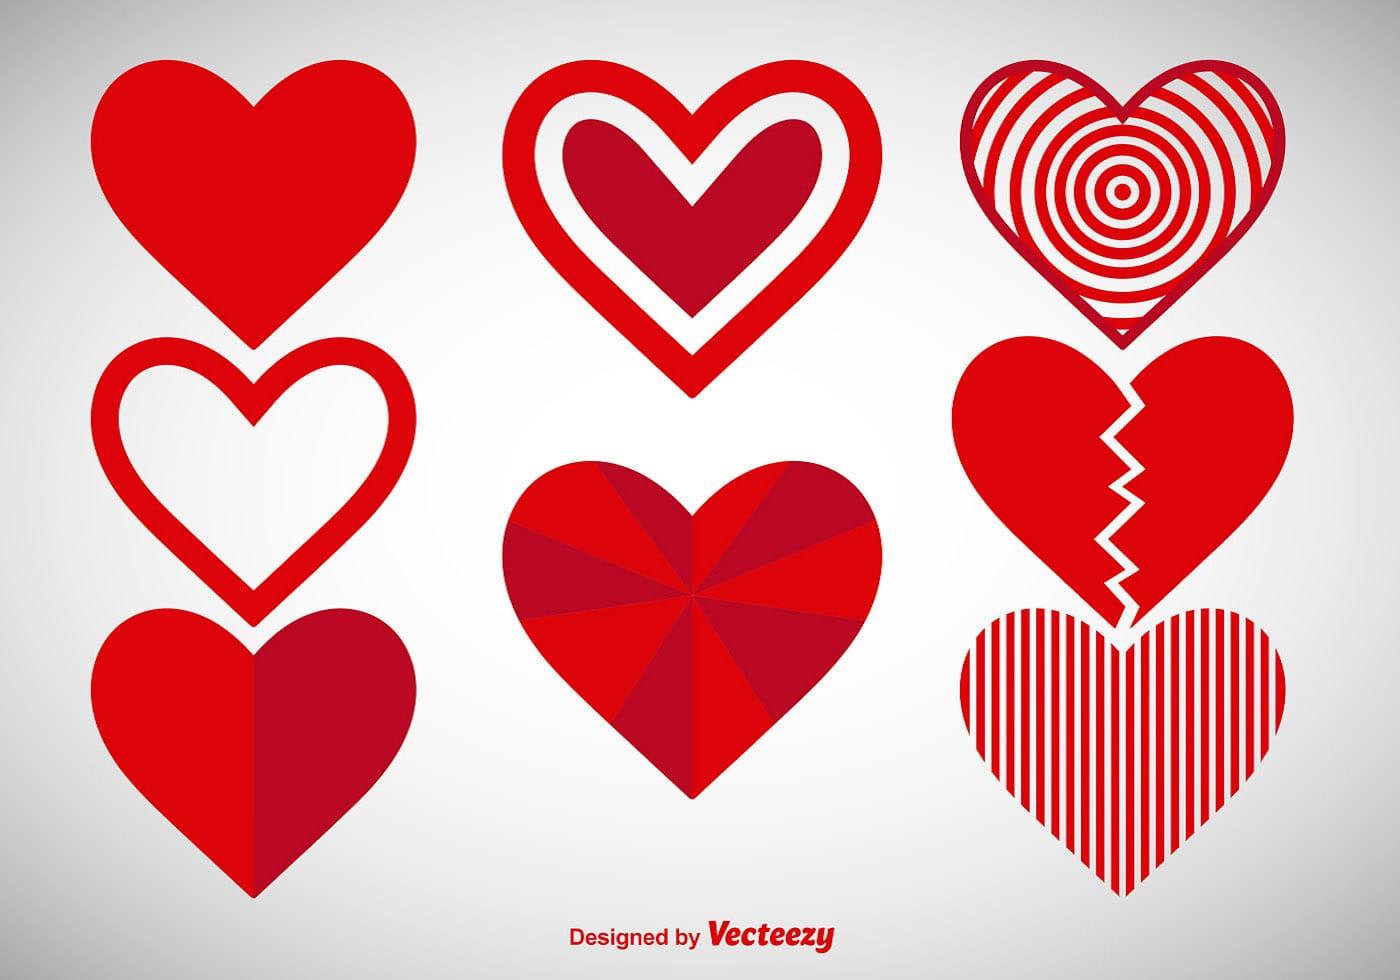 Free Heart Vector Art - (3098 Free Downloads)